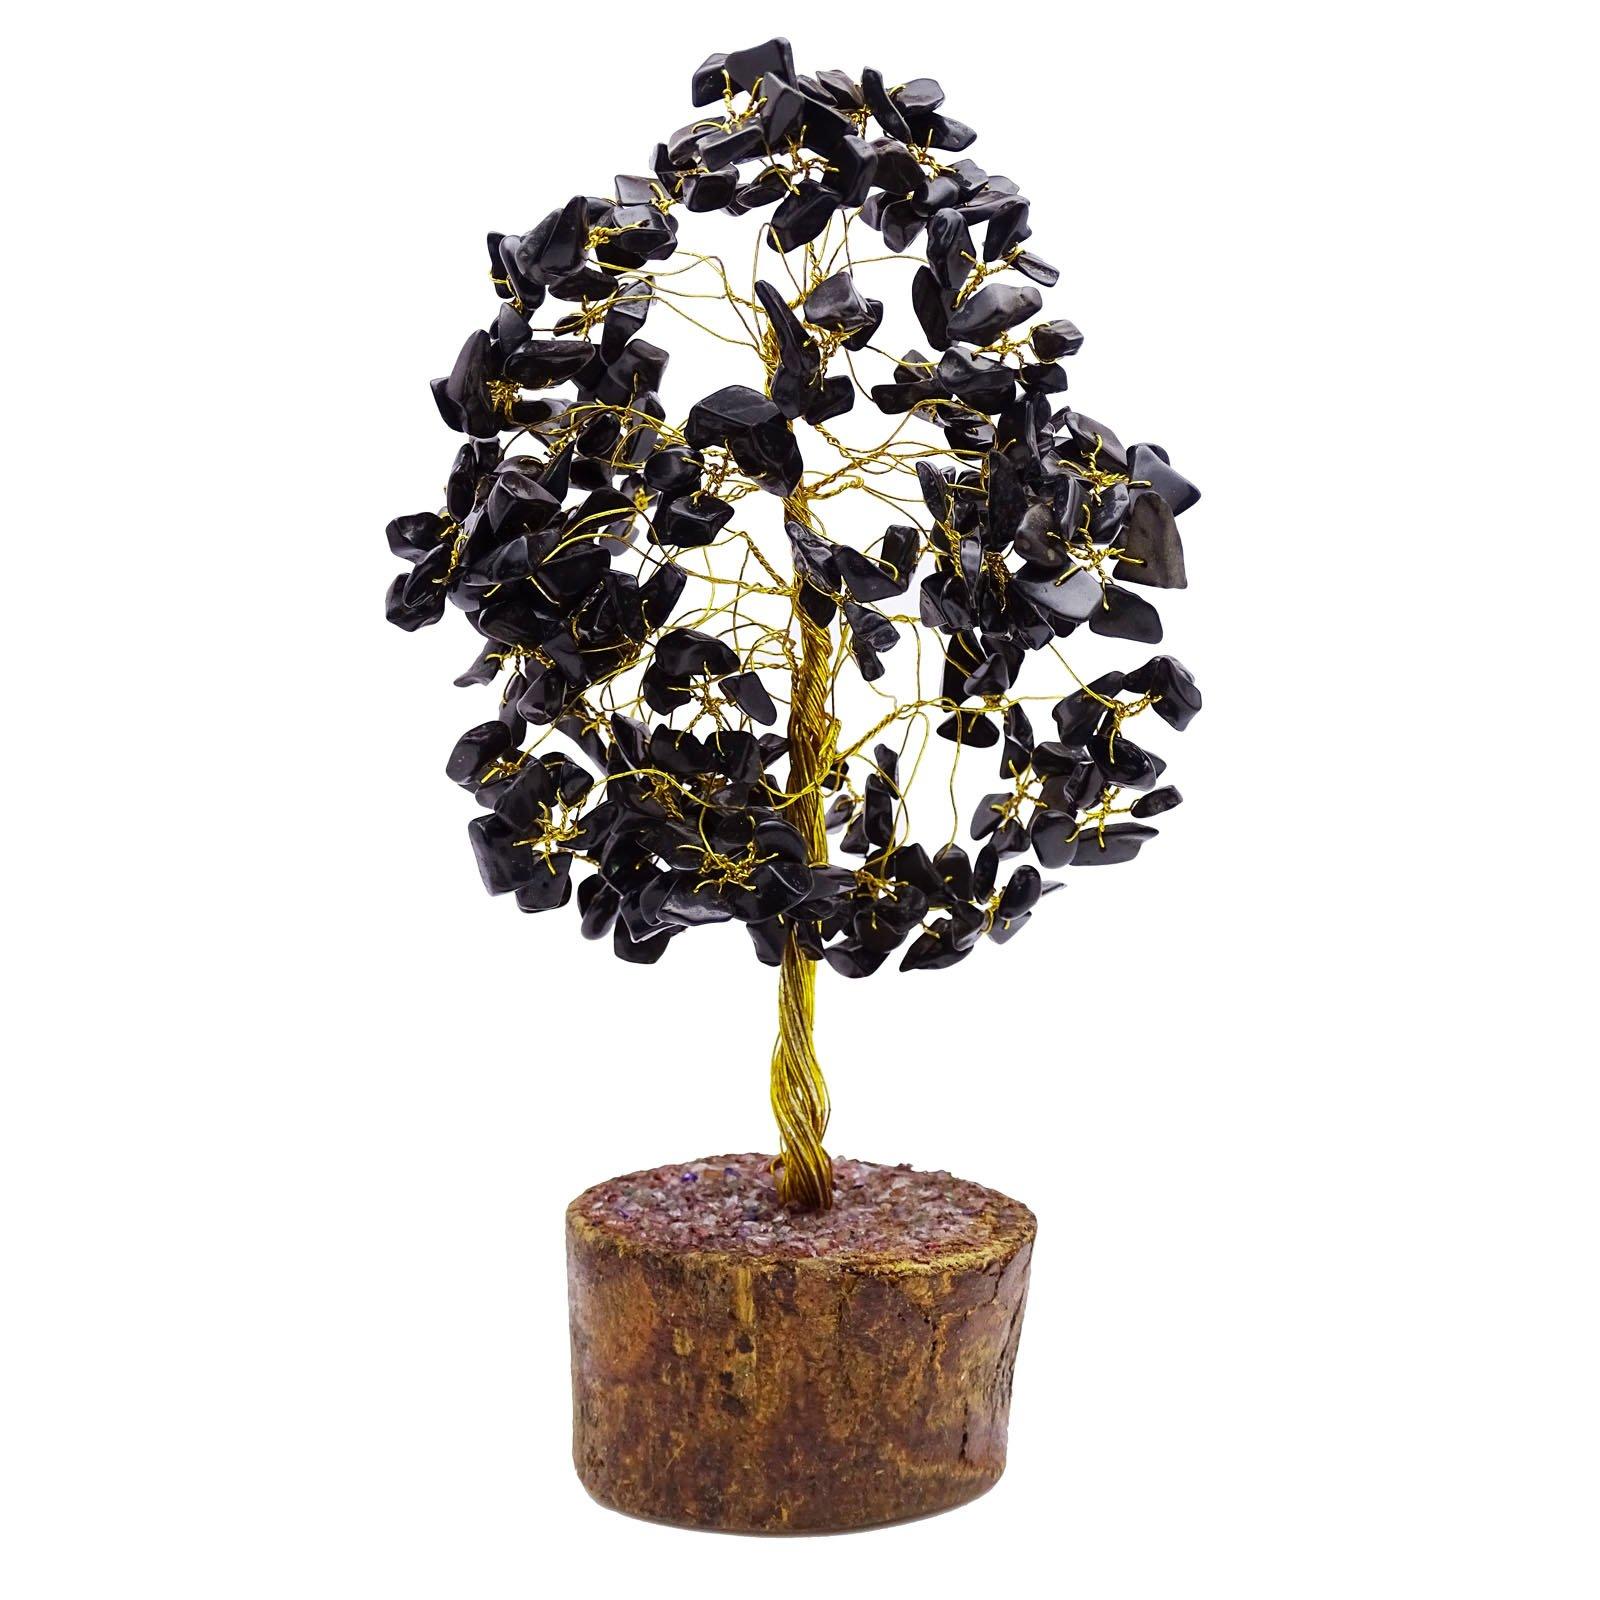 HARMONIZE Black Onyx Reiki Healing Stones Tree Feng Shui Spiritual Table Décor